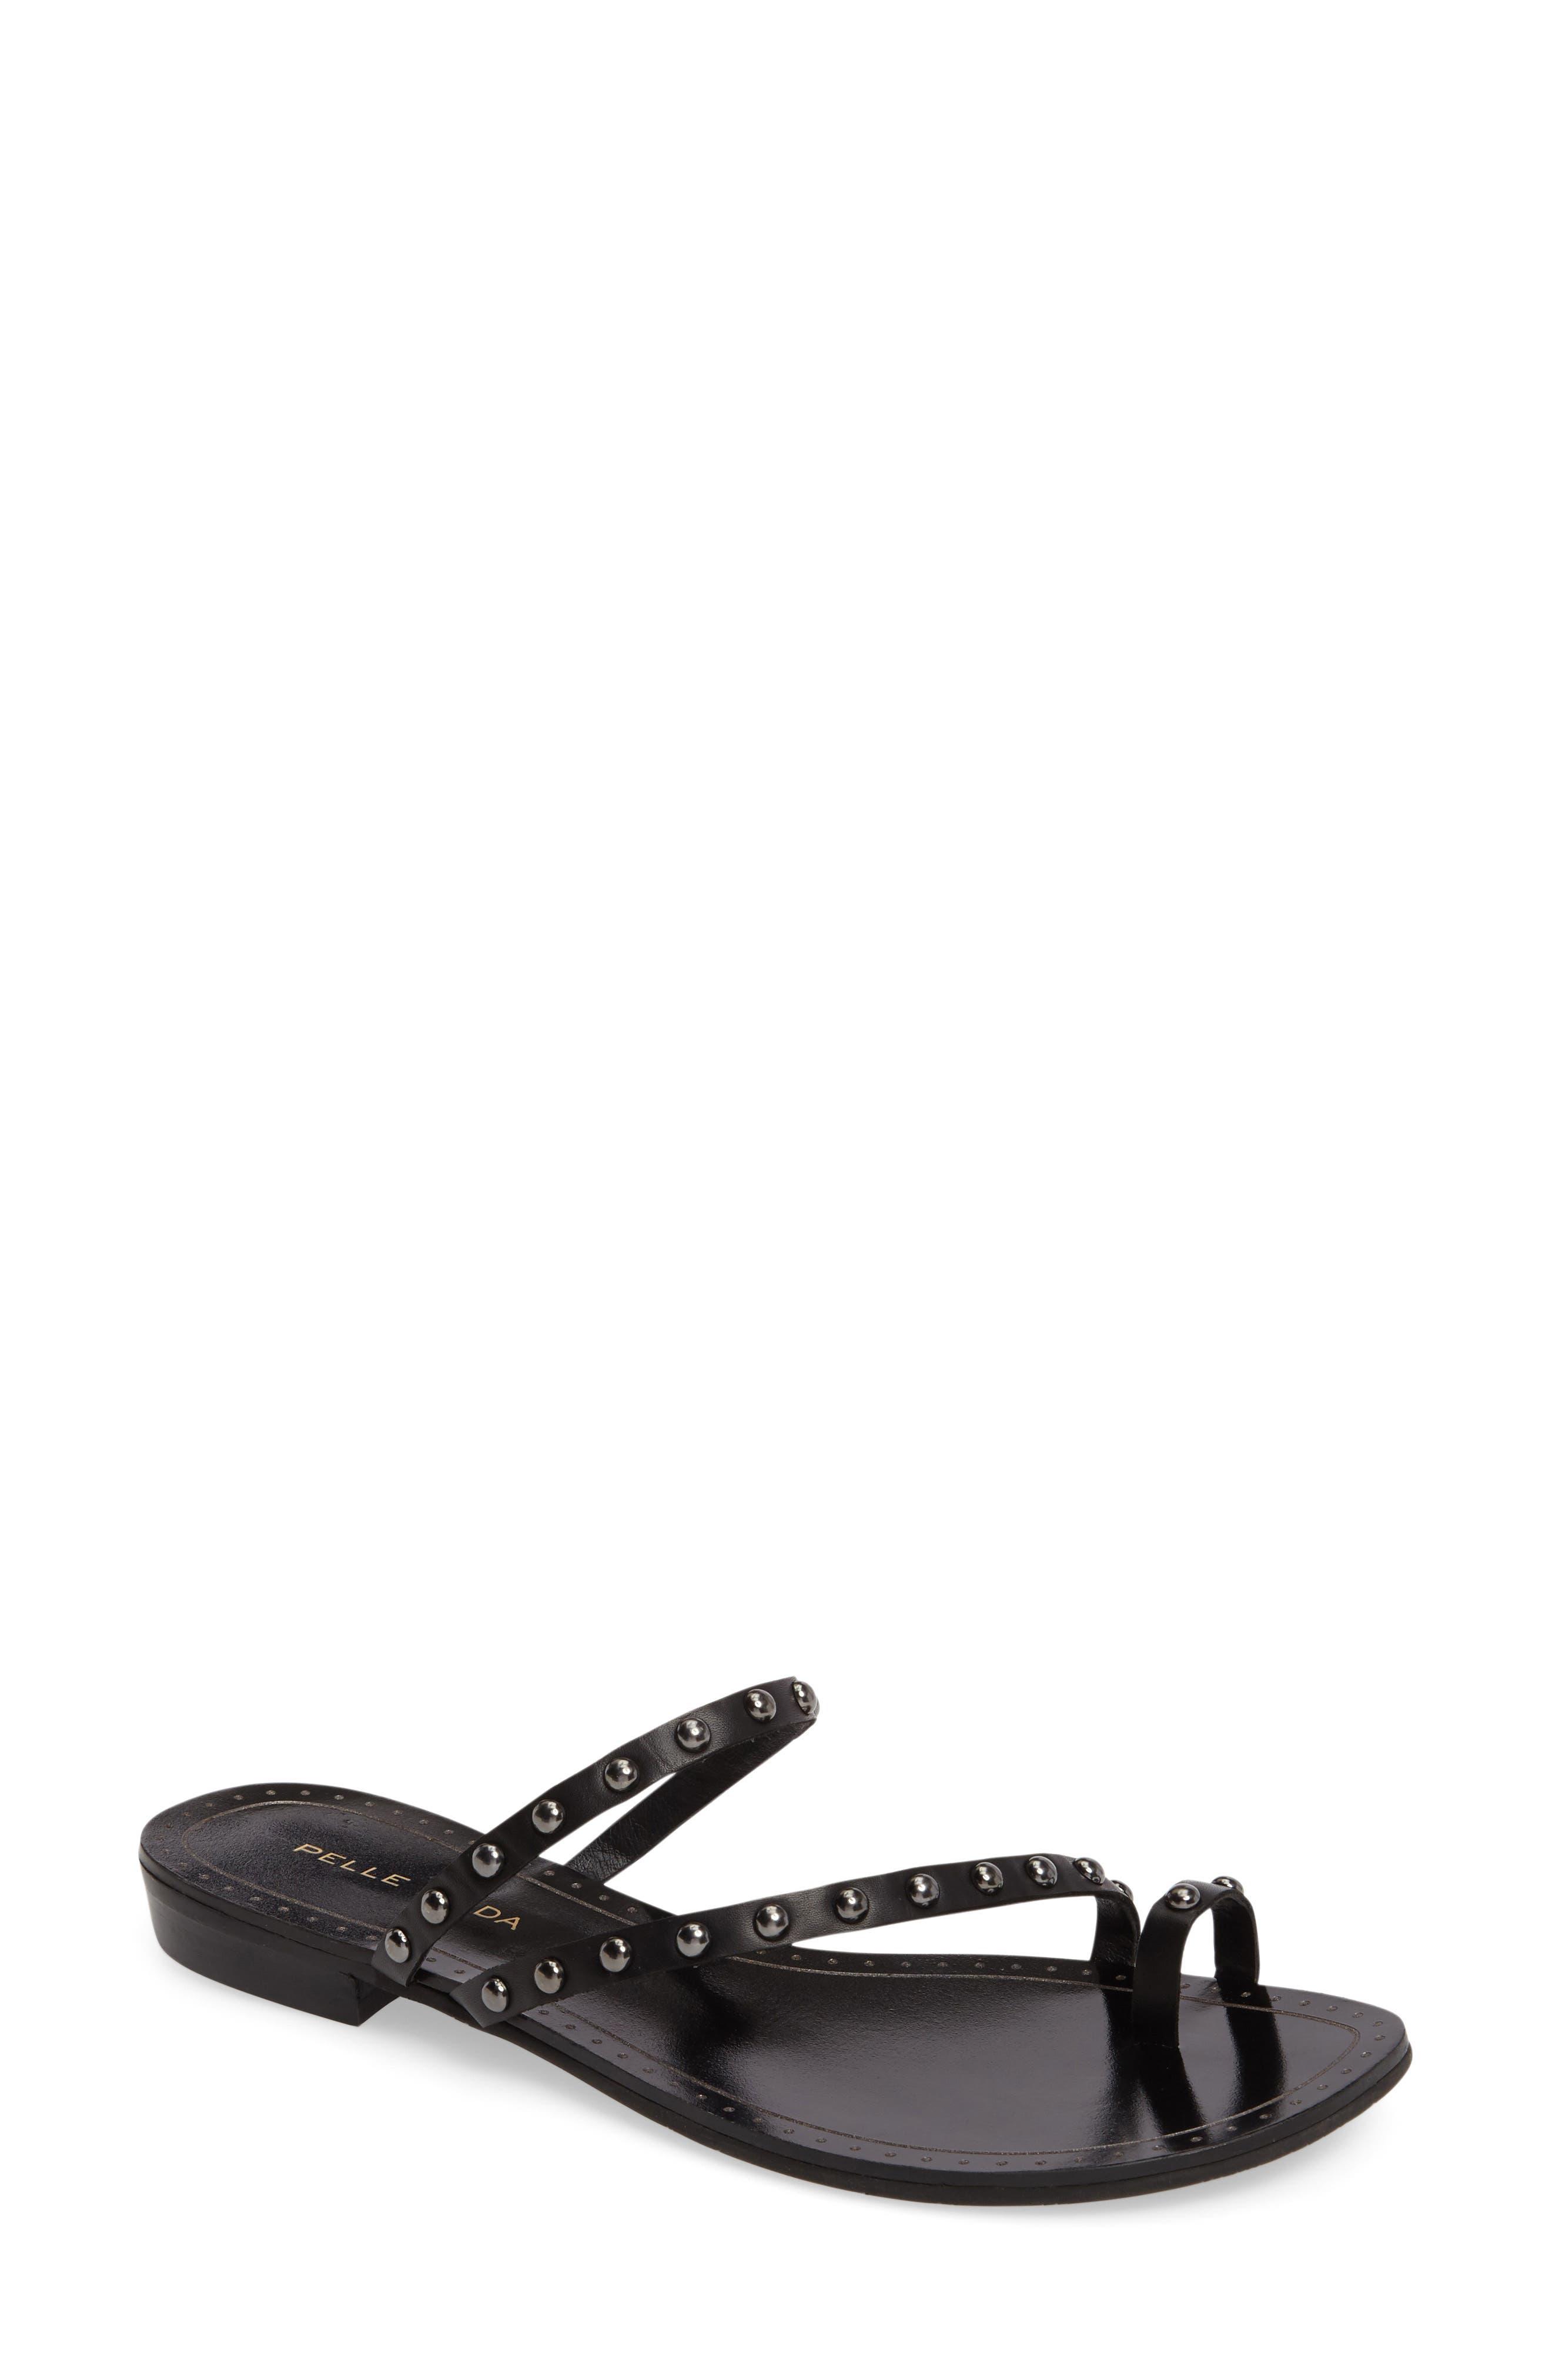 Bohem 2 Studded Sandal,                         Main,                         color, 001